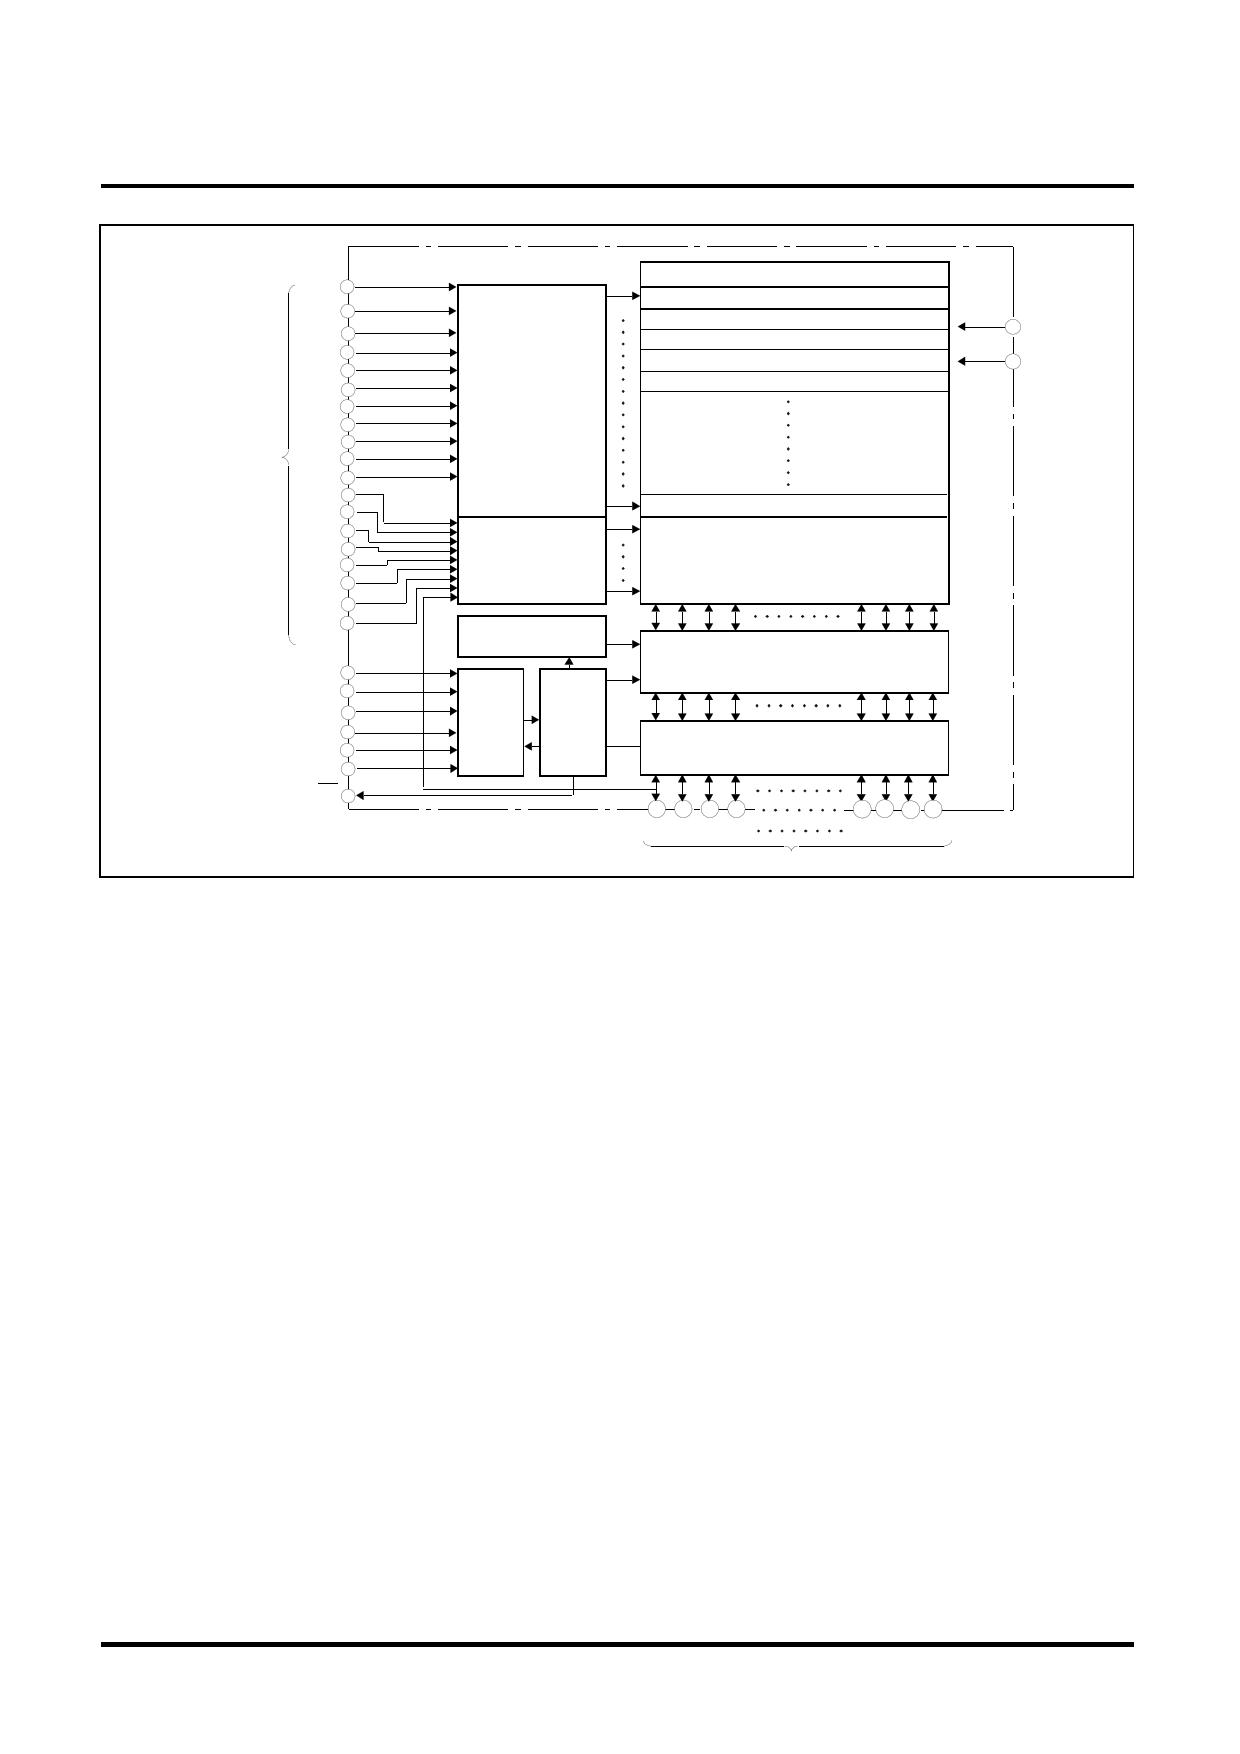 M5M29FB800RV-12 pdf, equivalent, schematic